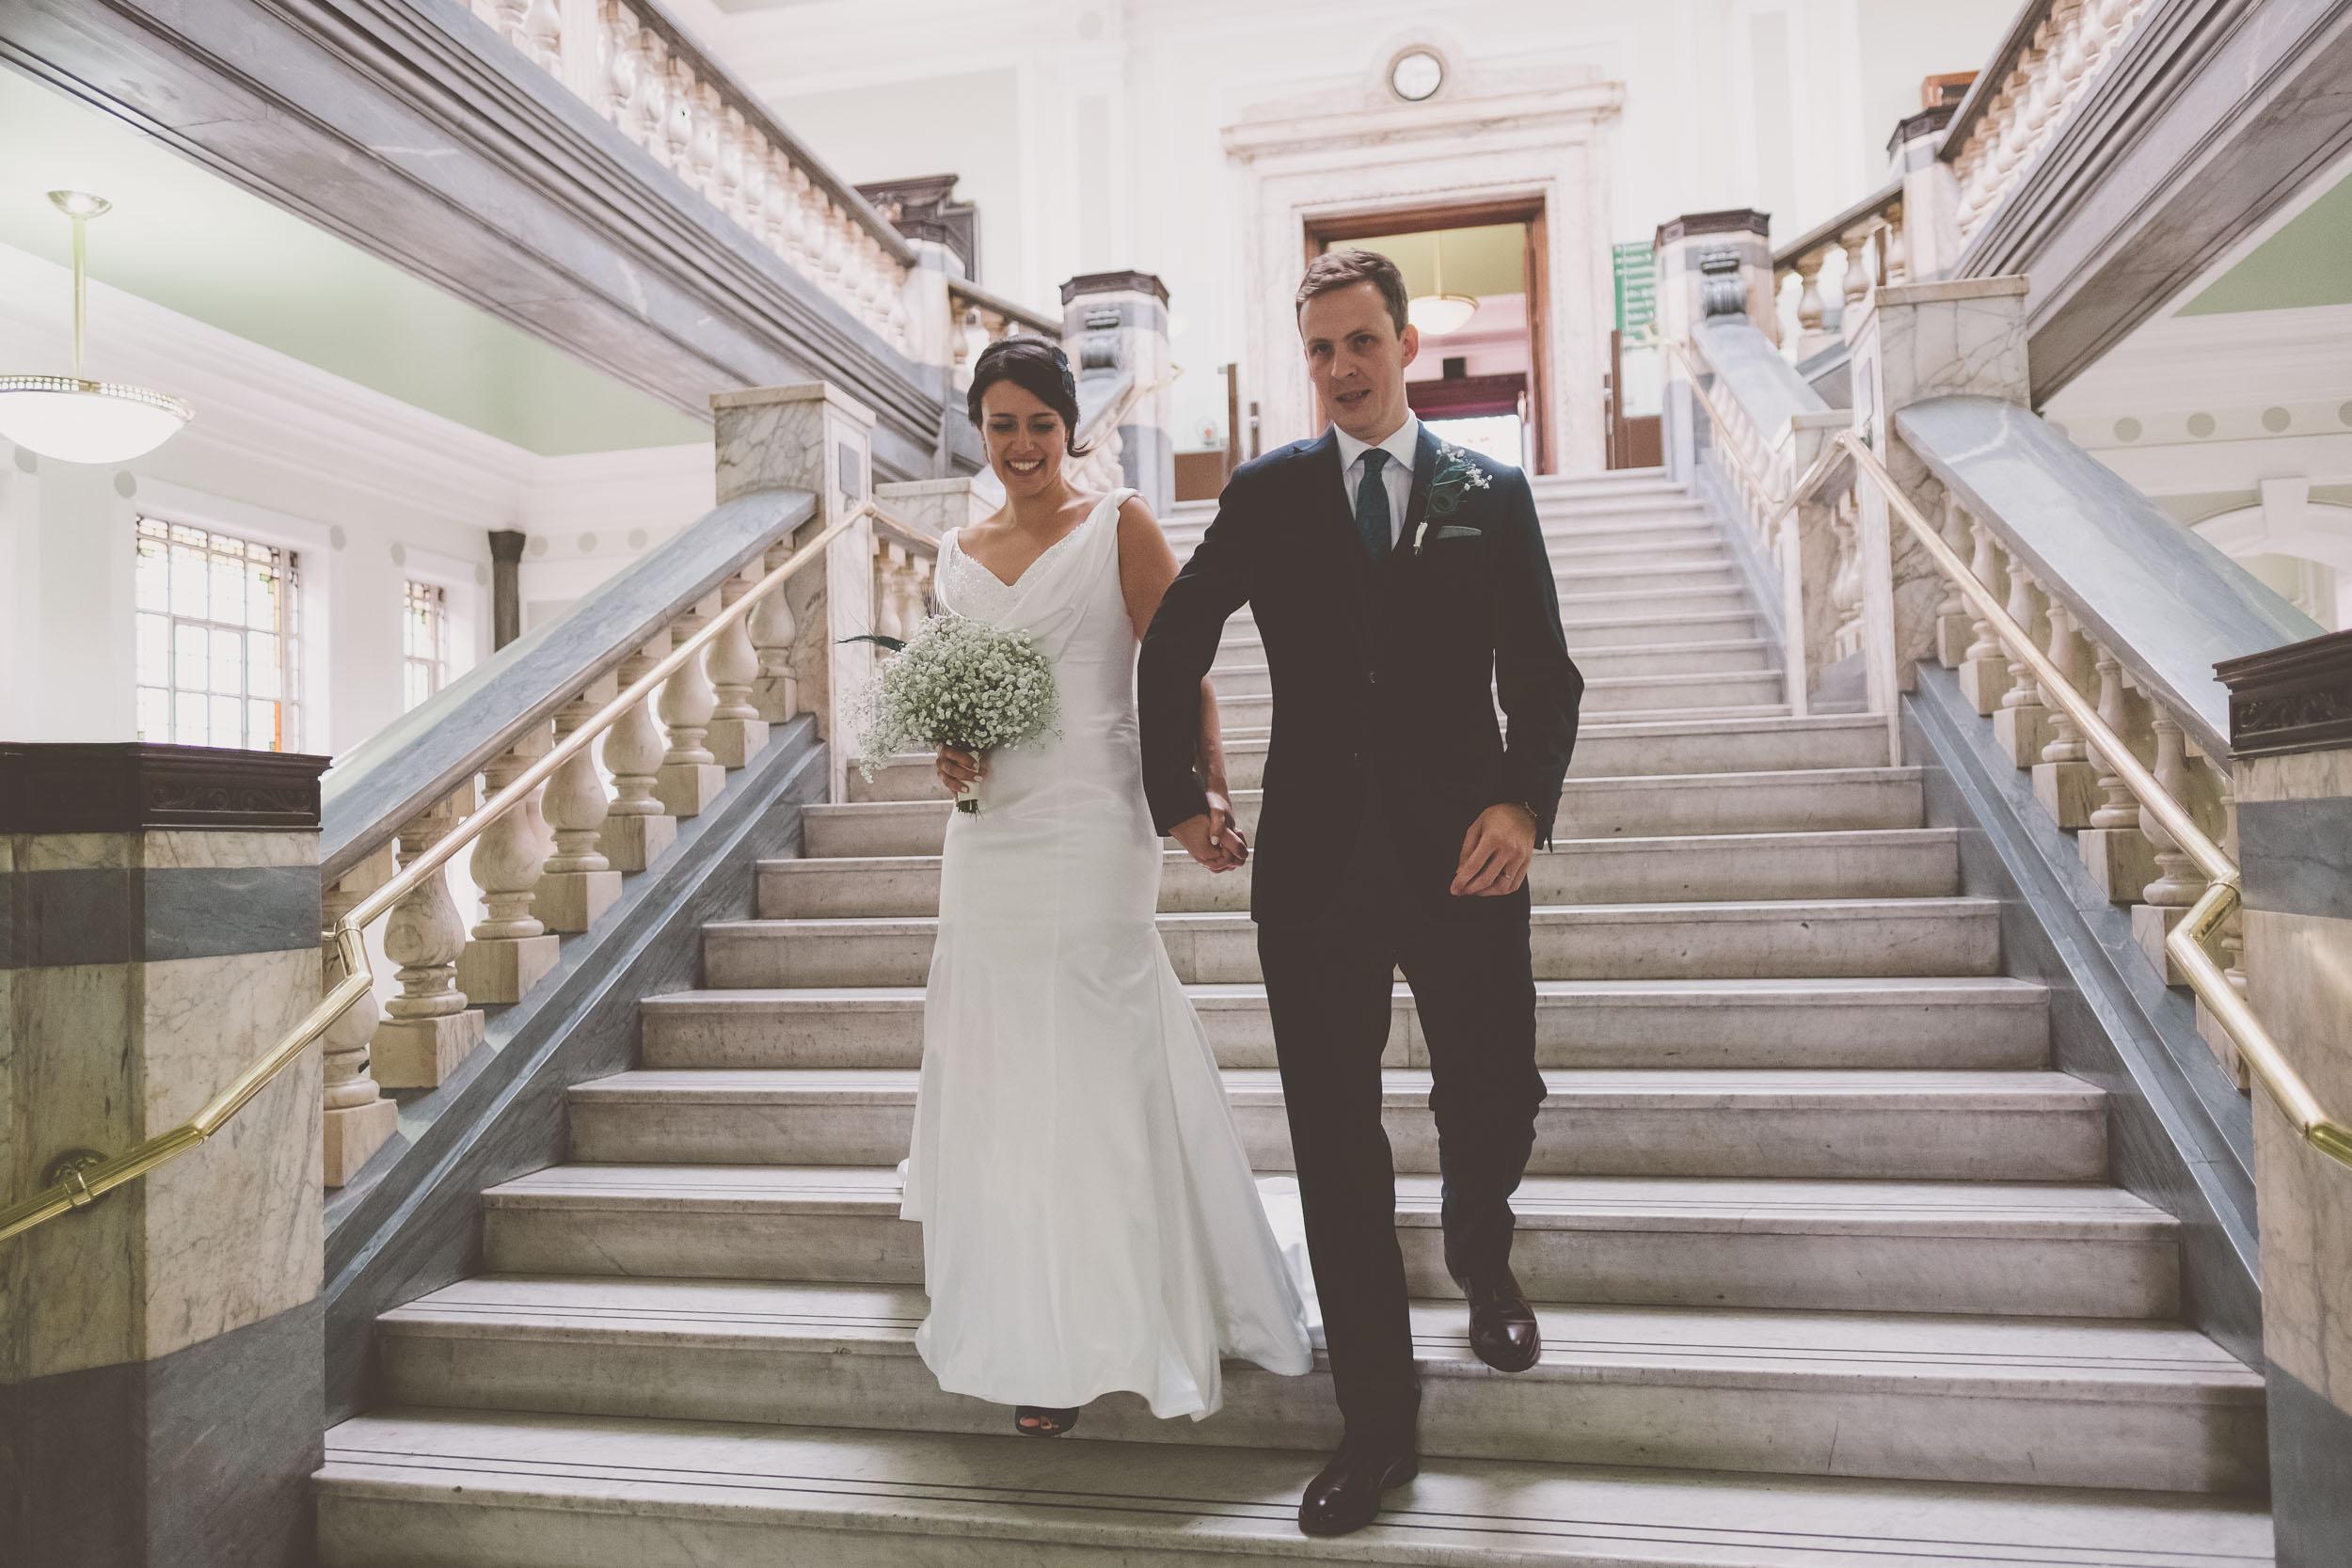 islington-town-hall-4th-floor-studios-wedding143.jpg